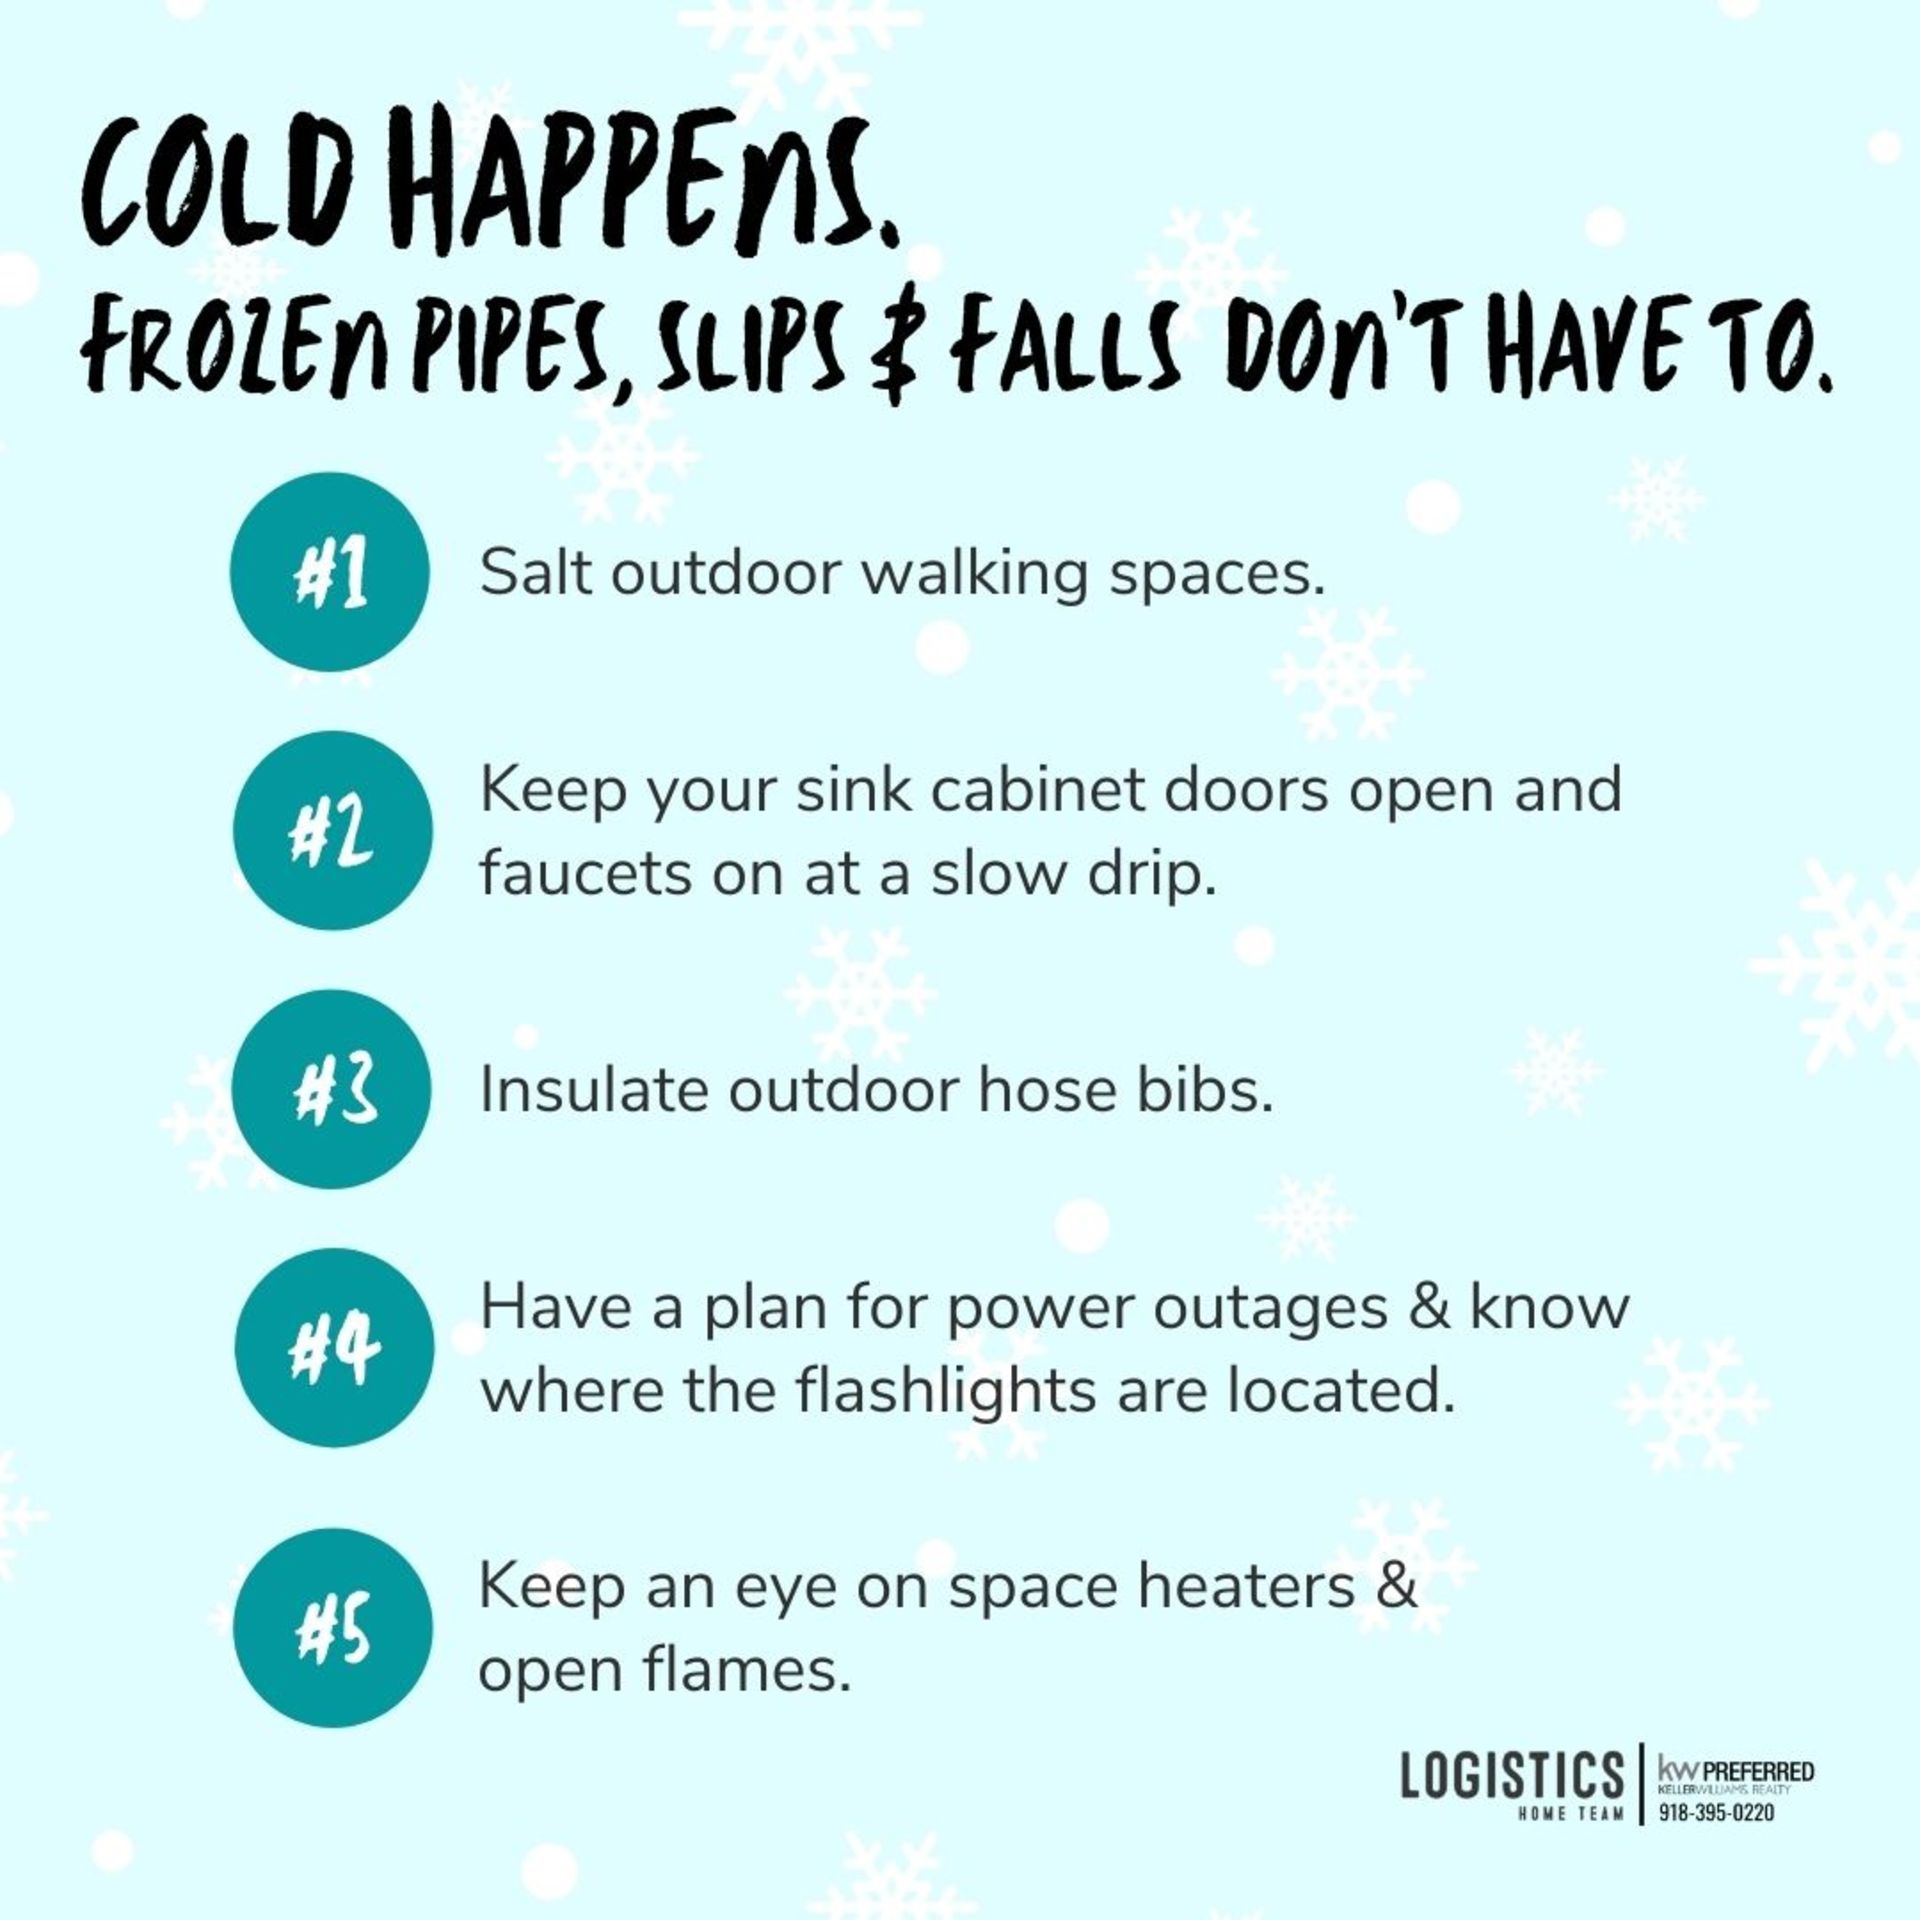 COLD HAPPENS!